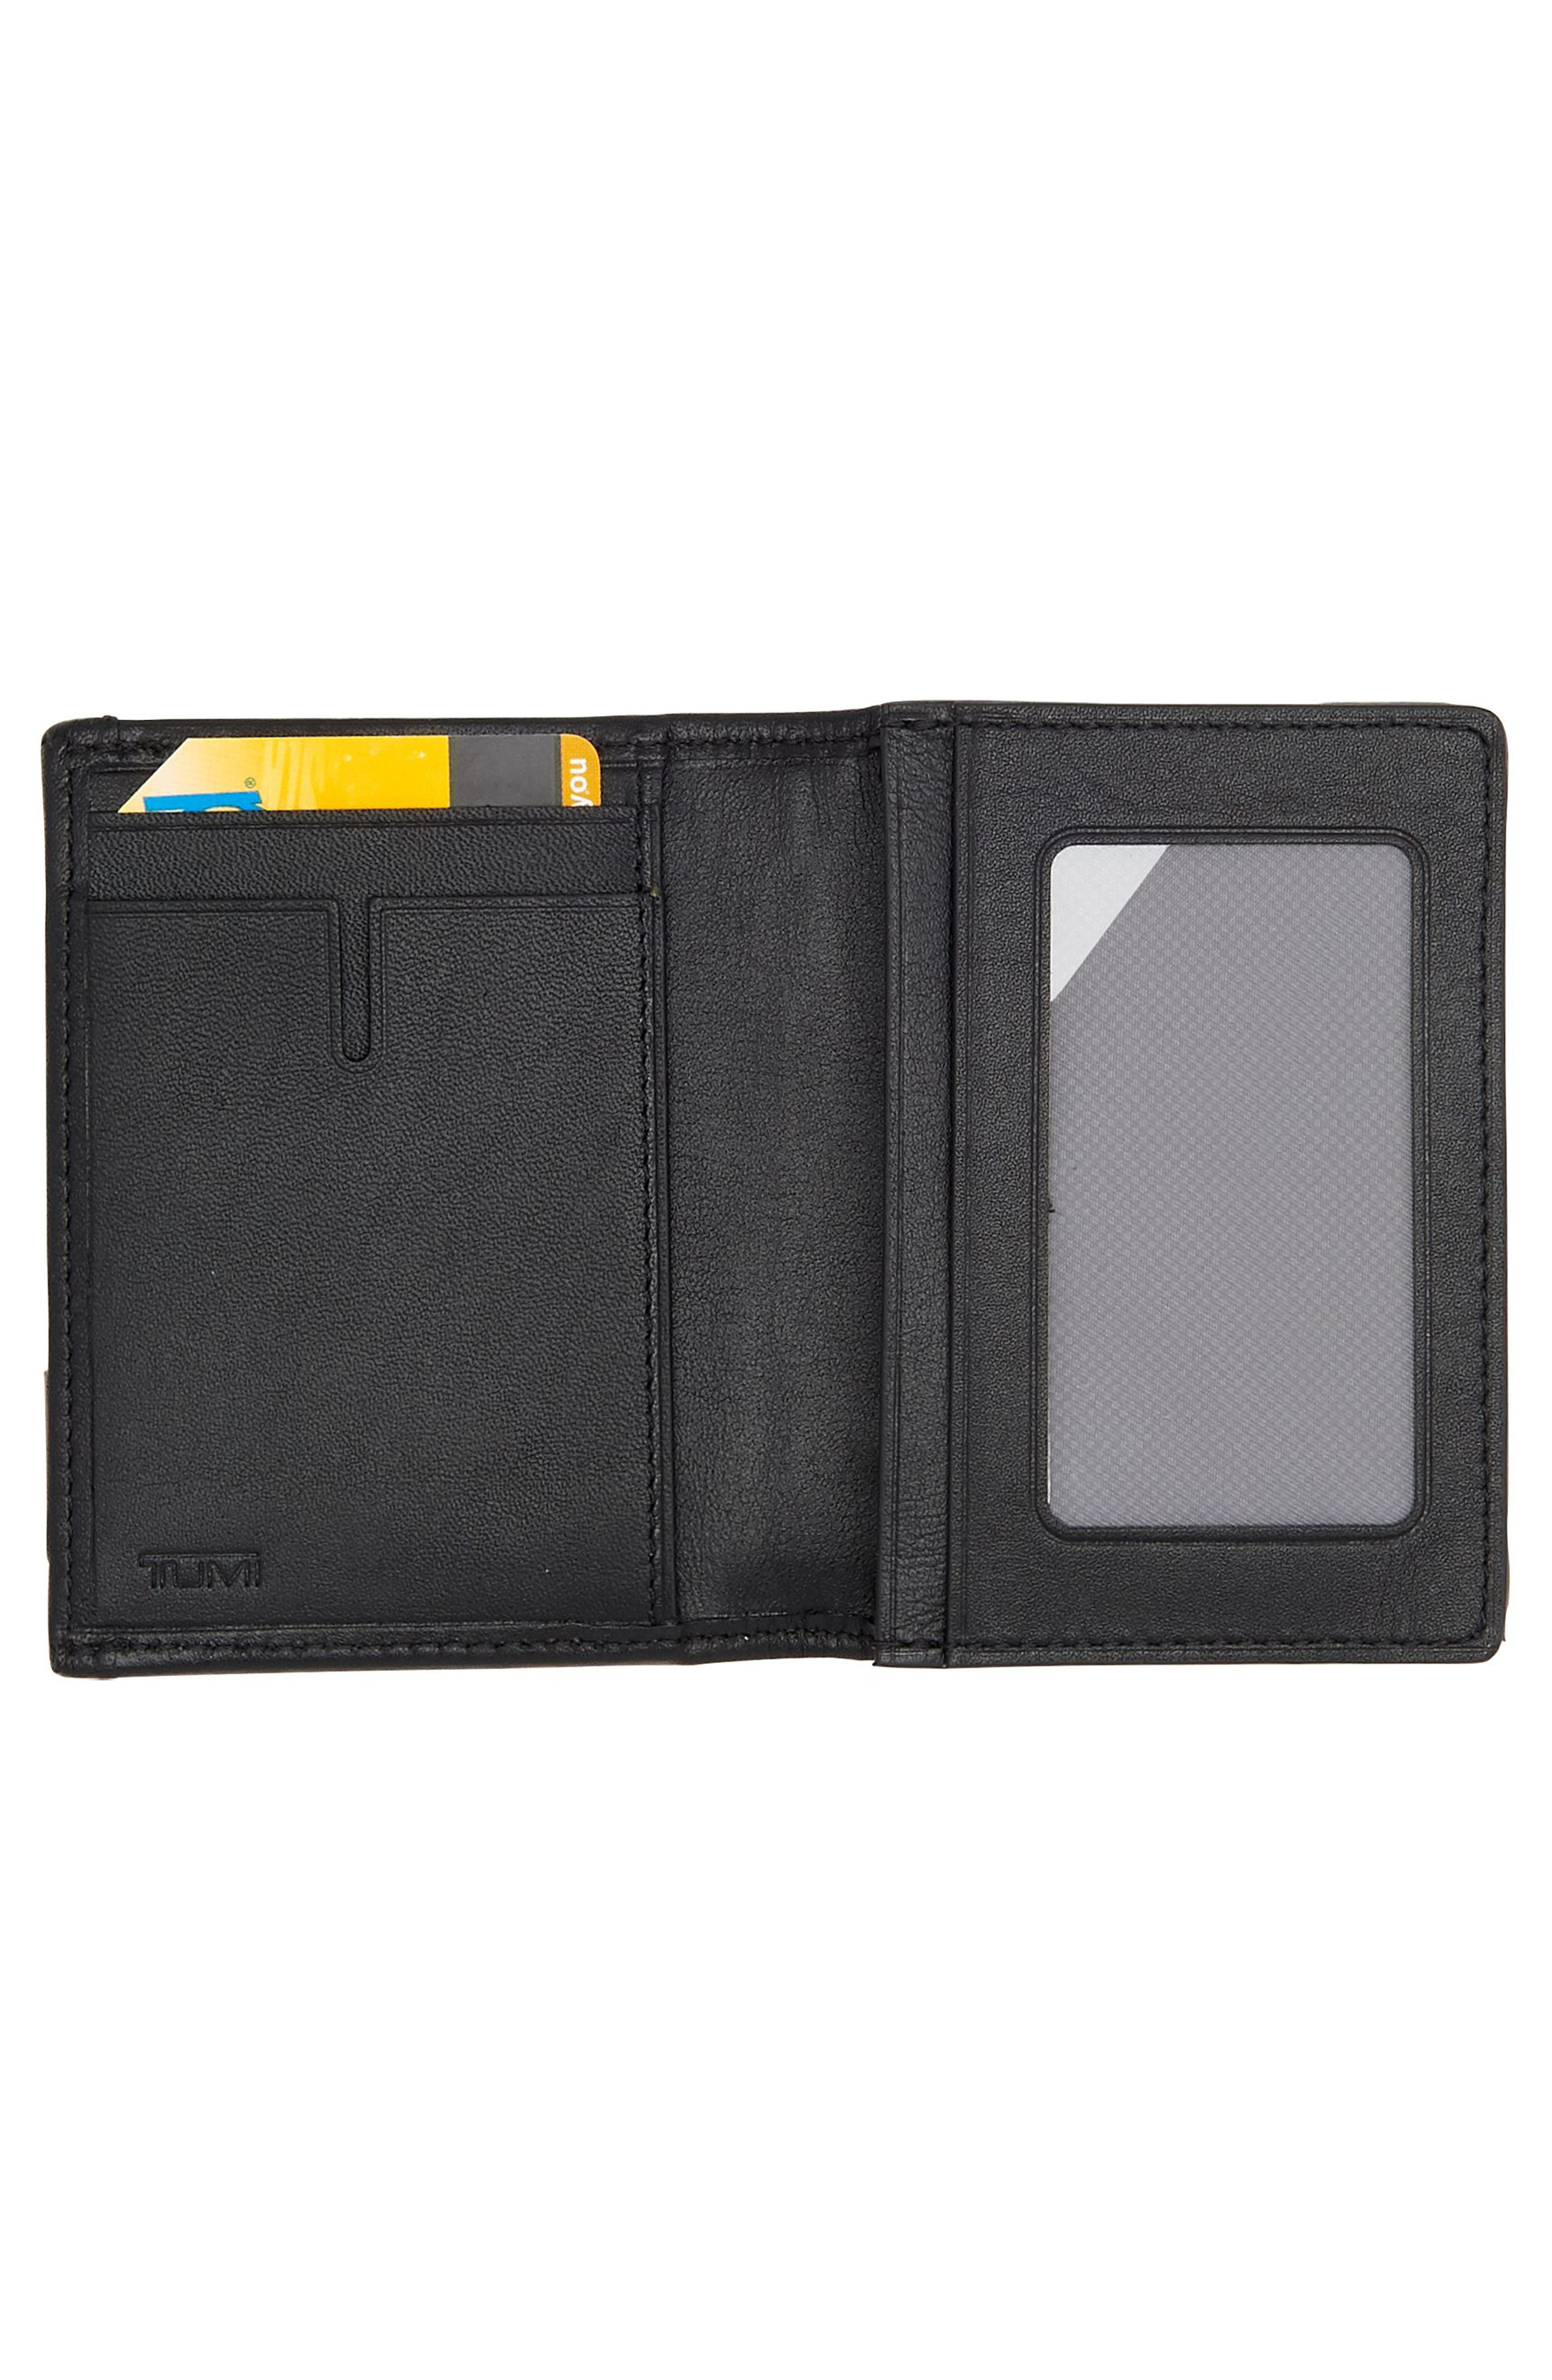 Alpha Card Case,                             Alternate thumbnail 2, color,                             Anthracite/ Black